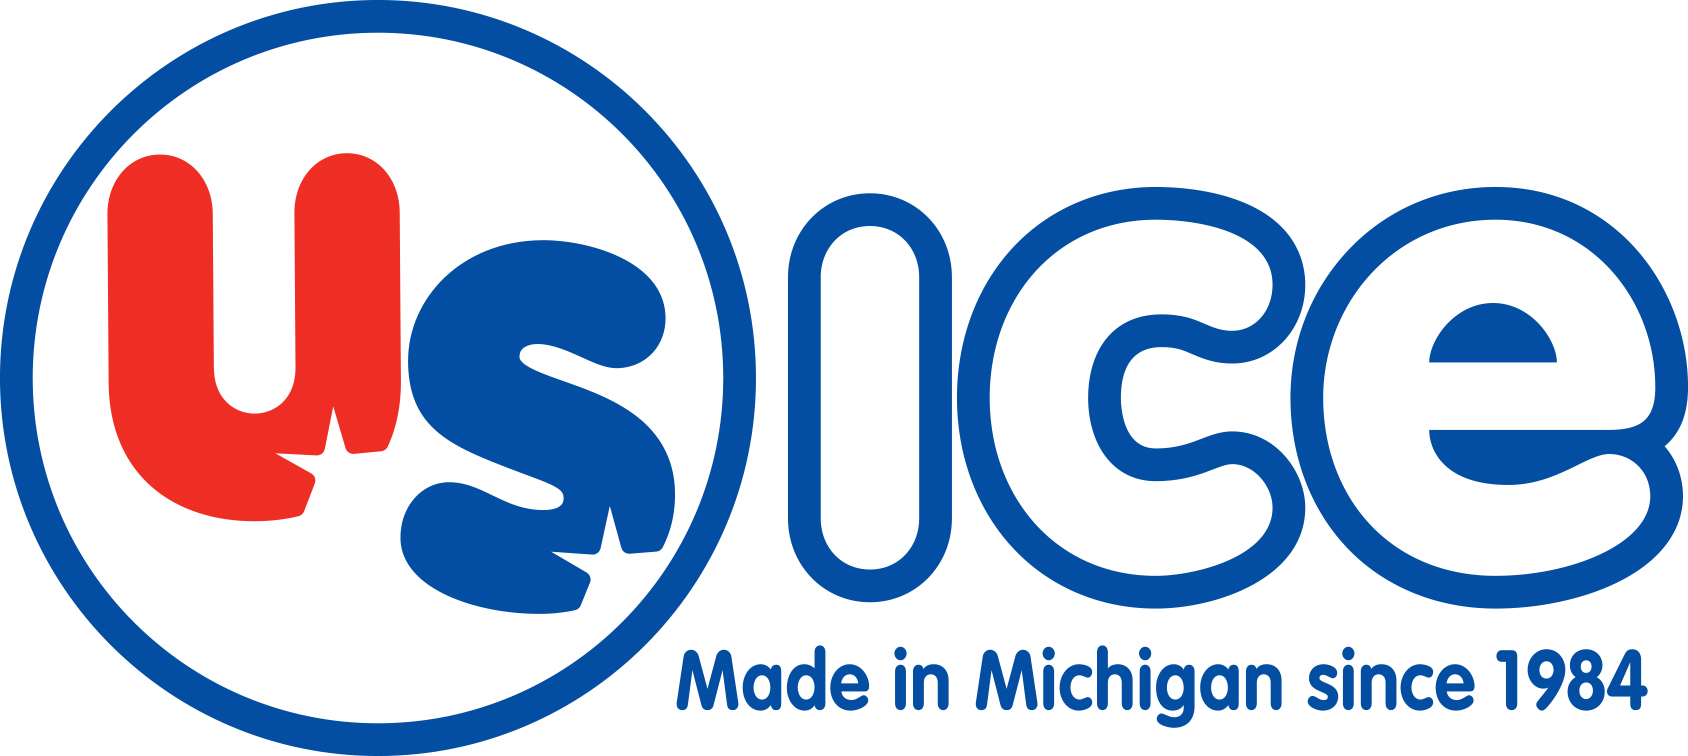 US Ice Logo - Made in Michigan Since 1984.jpg